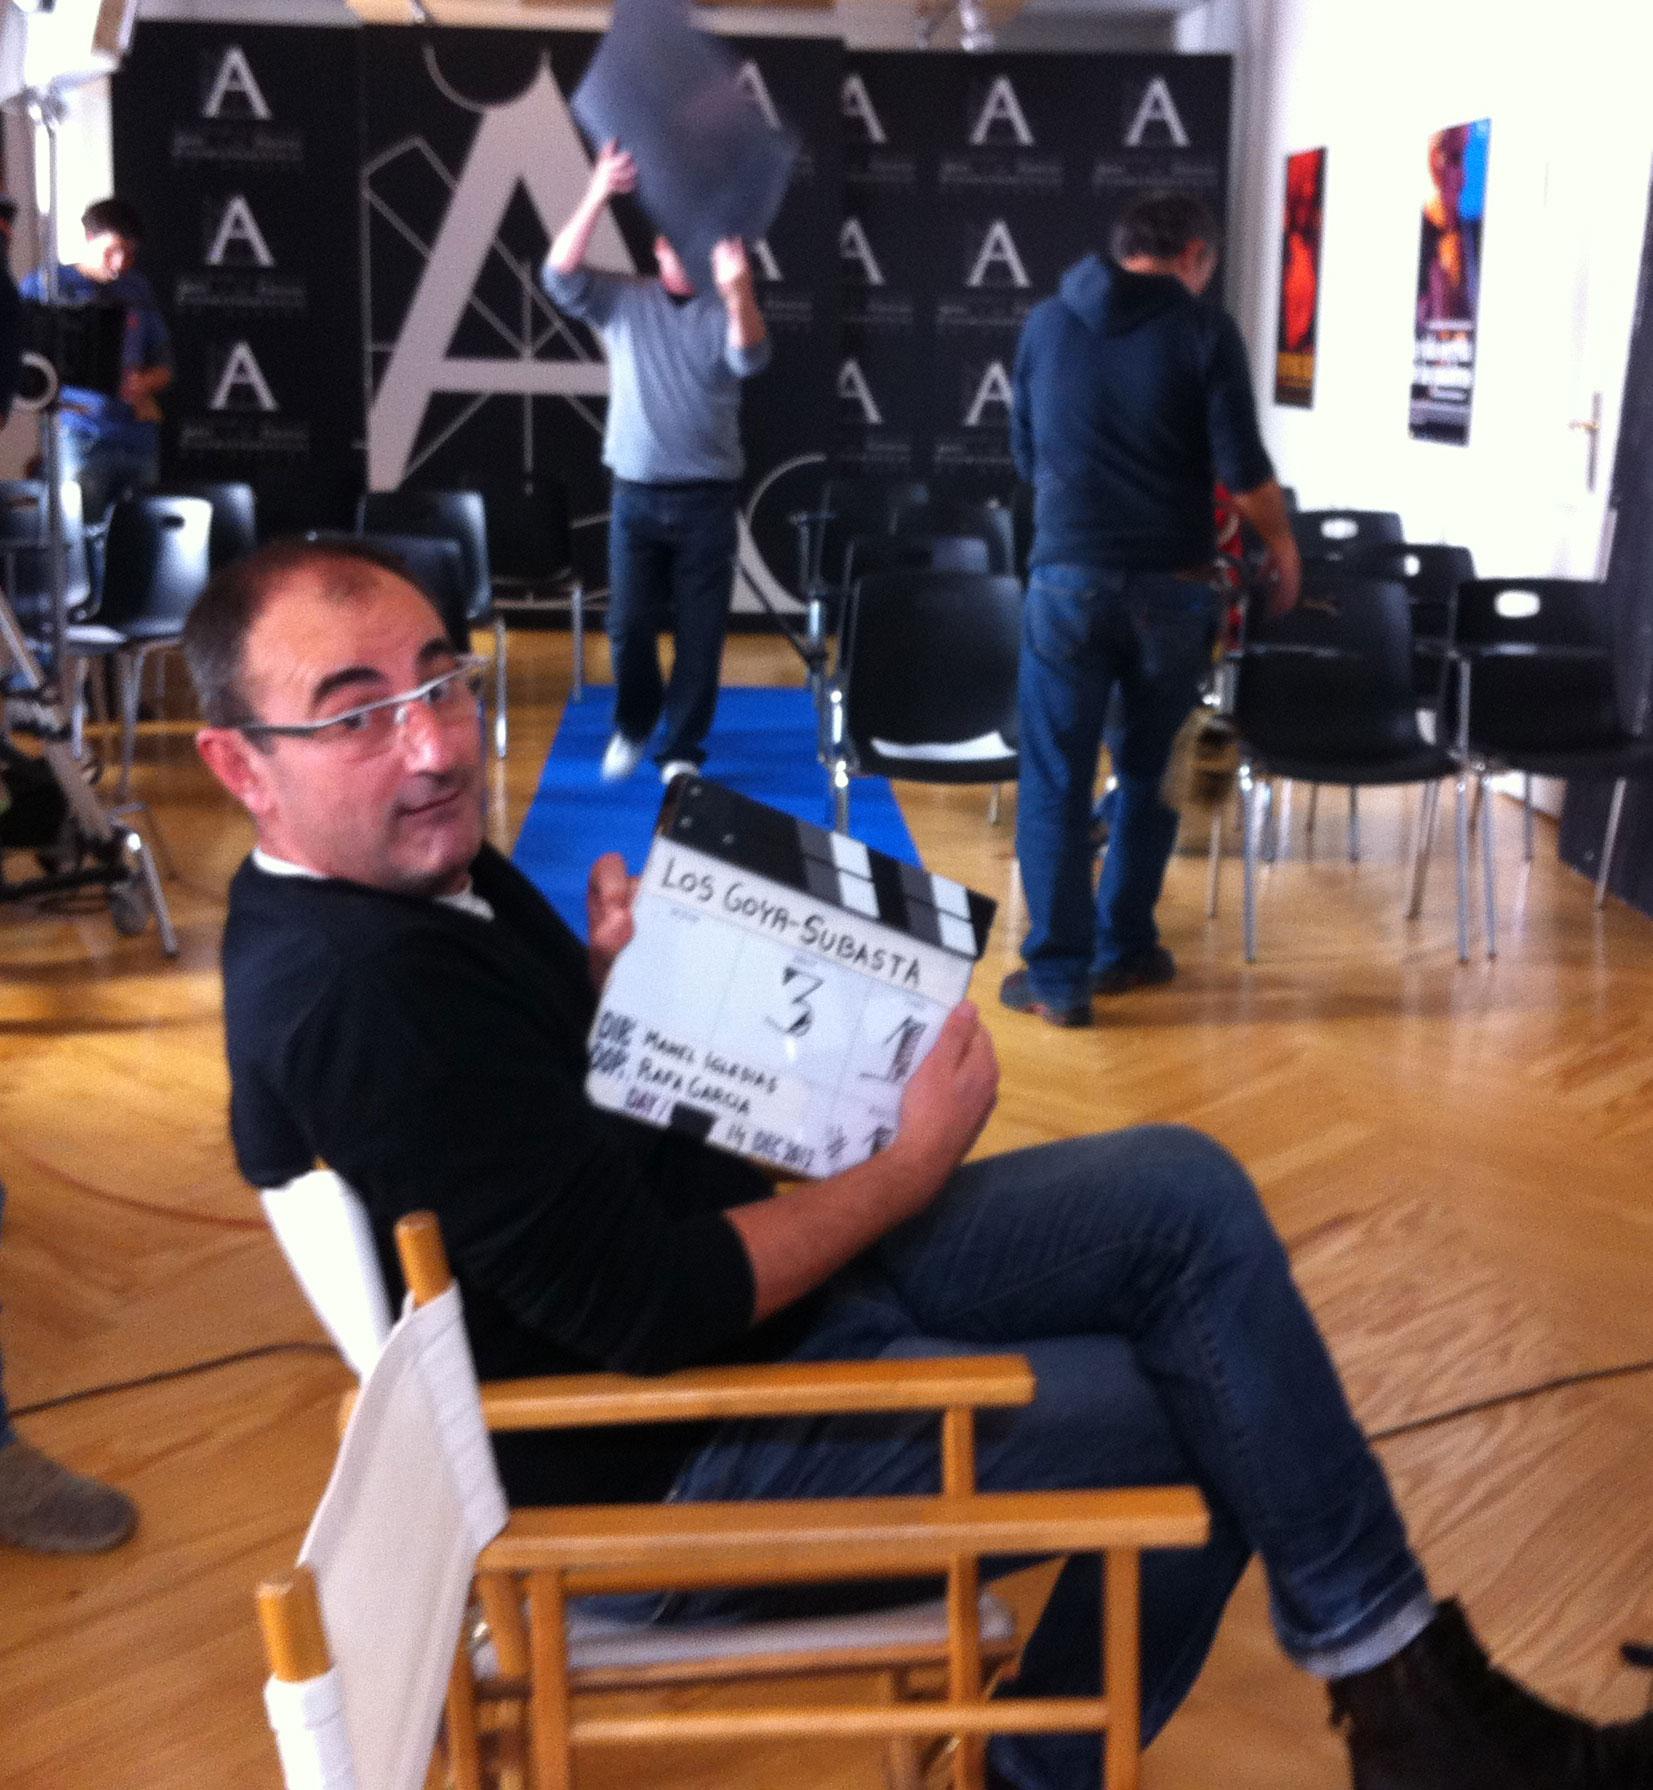 Grabando promo Premios Goyas 2013